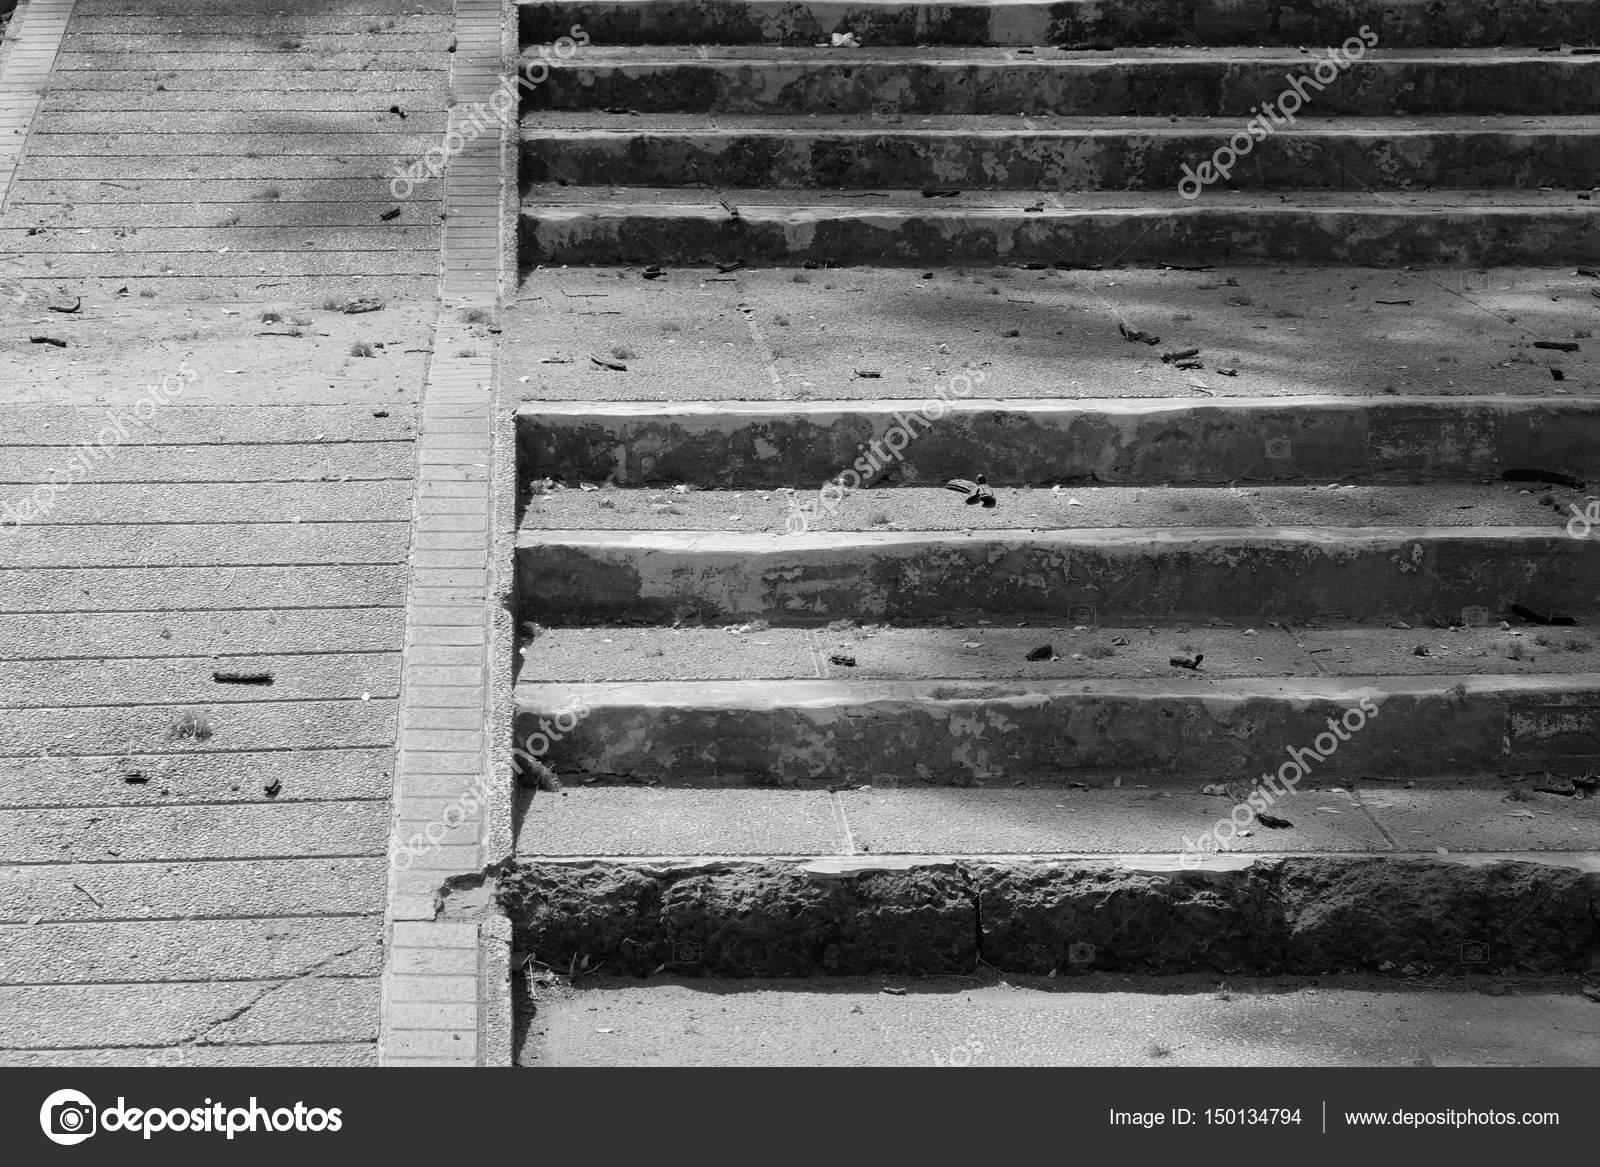 Zwart wit steen en betonnen trap detail van de moderne